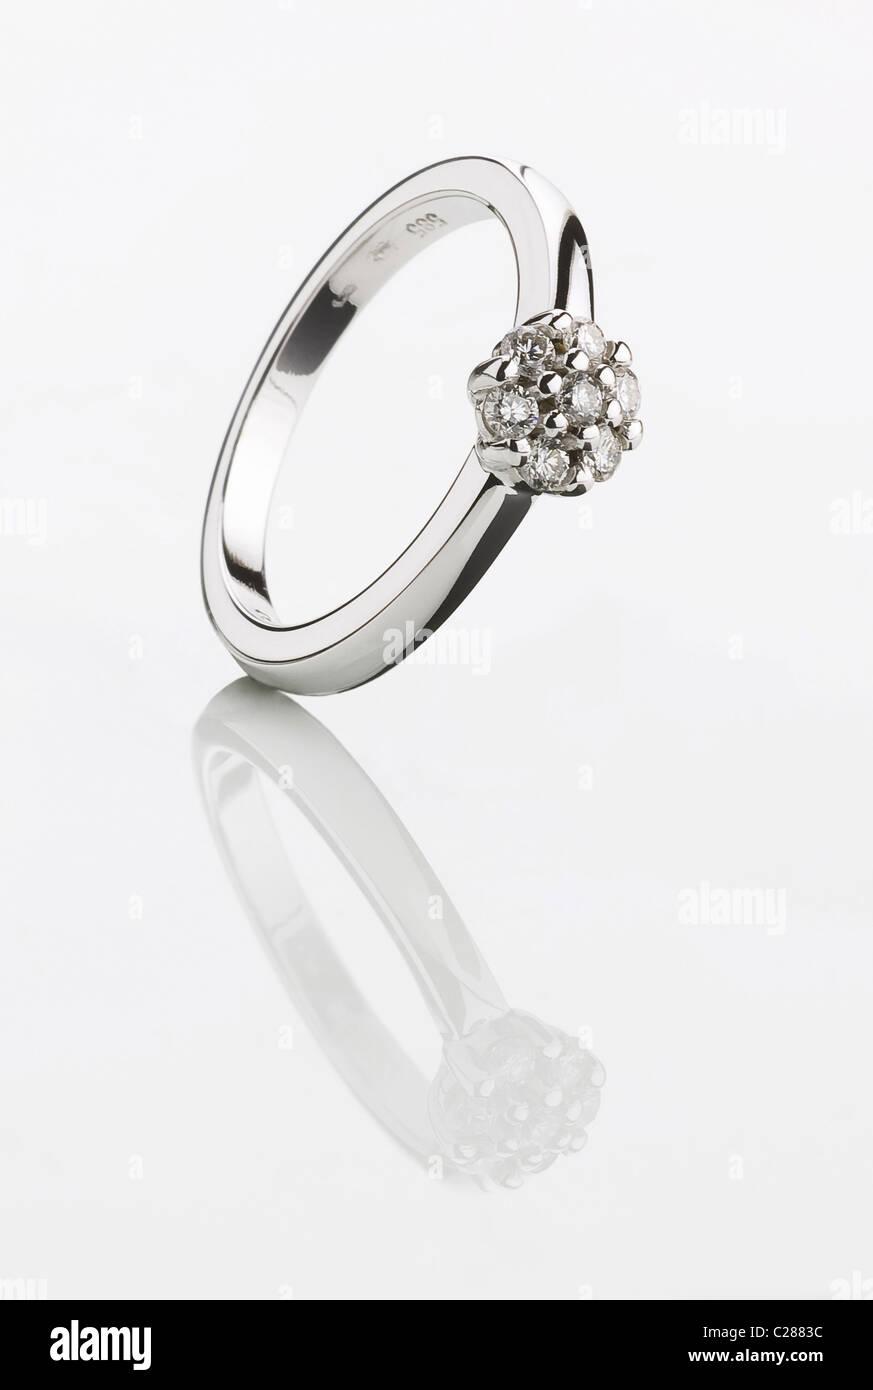 Beautiful silver ring with precious gems - studio - Stock Image